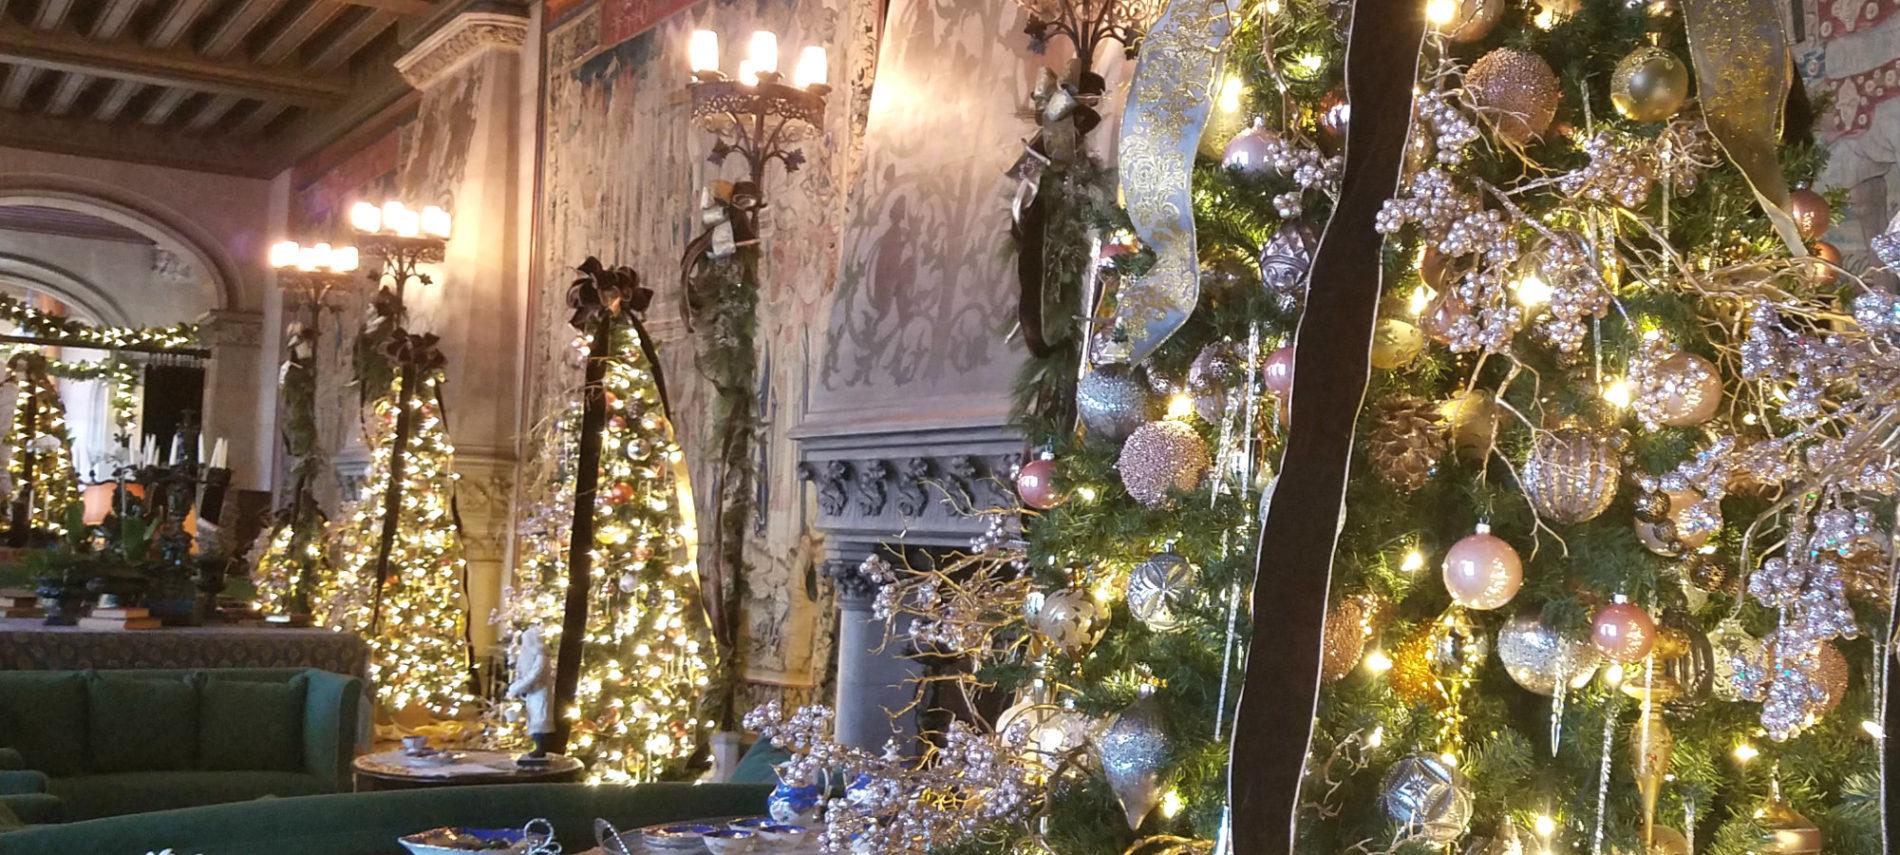 2018 Christmas at Biltmore Estate in Asheville